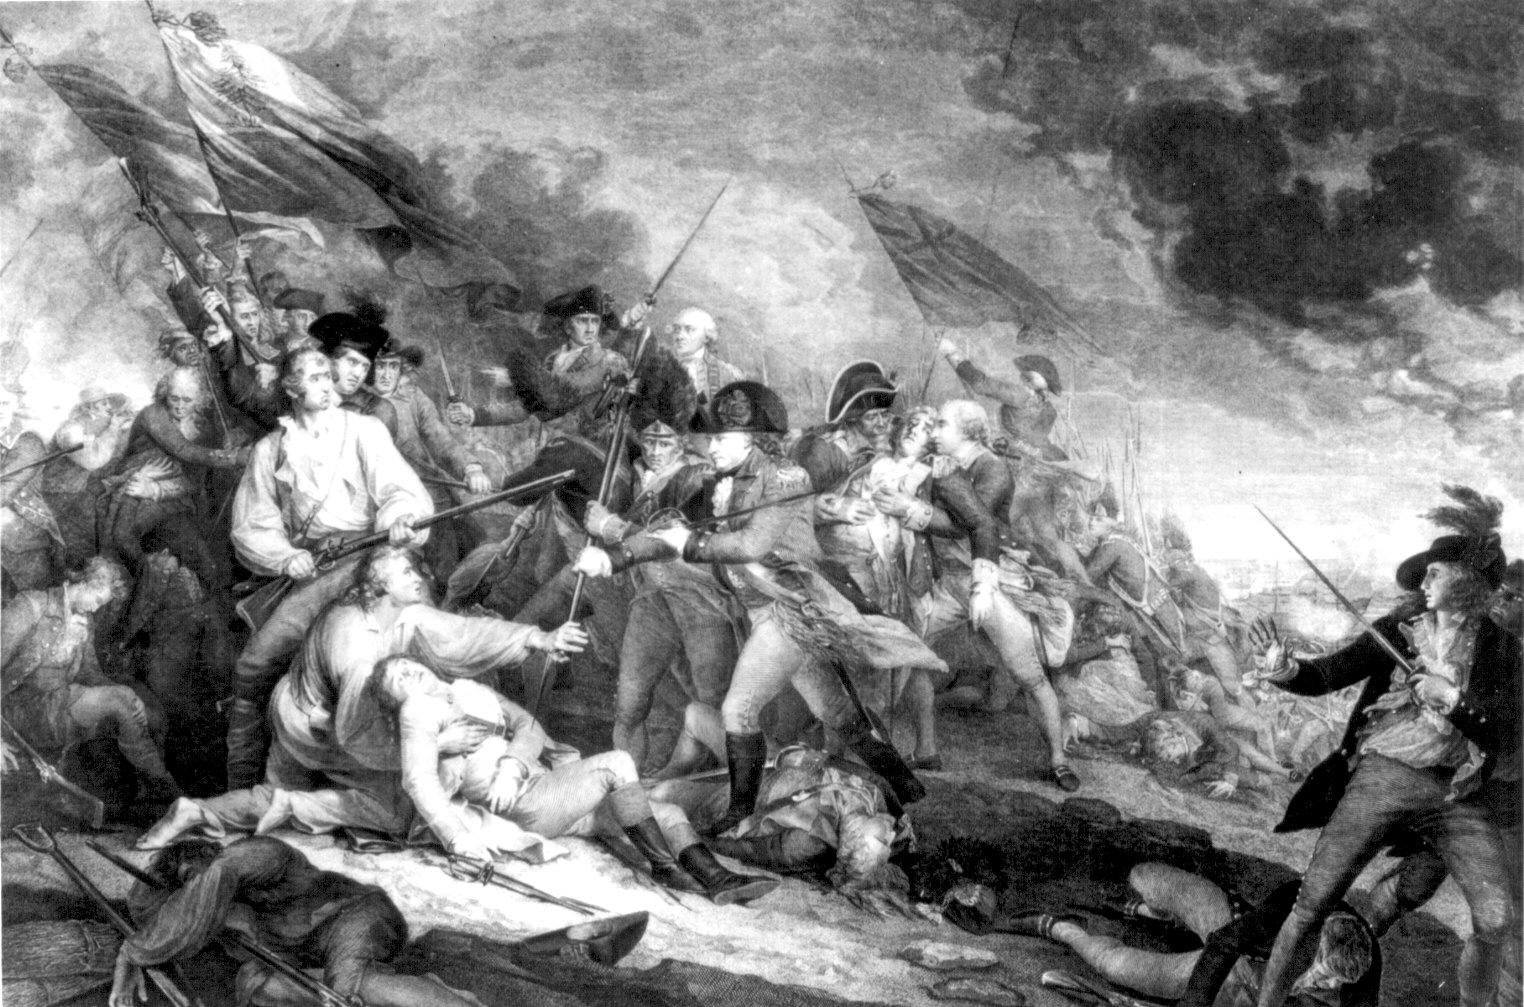 John Trumbull S Prints Of The American Revolution